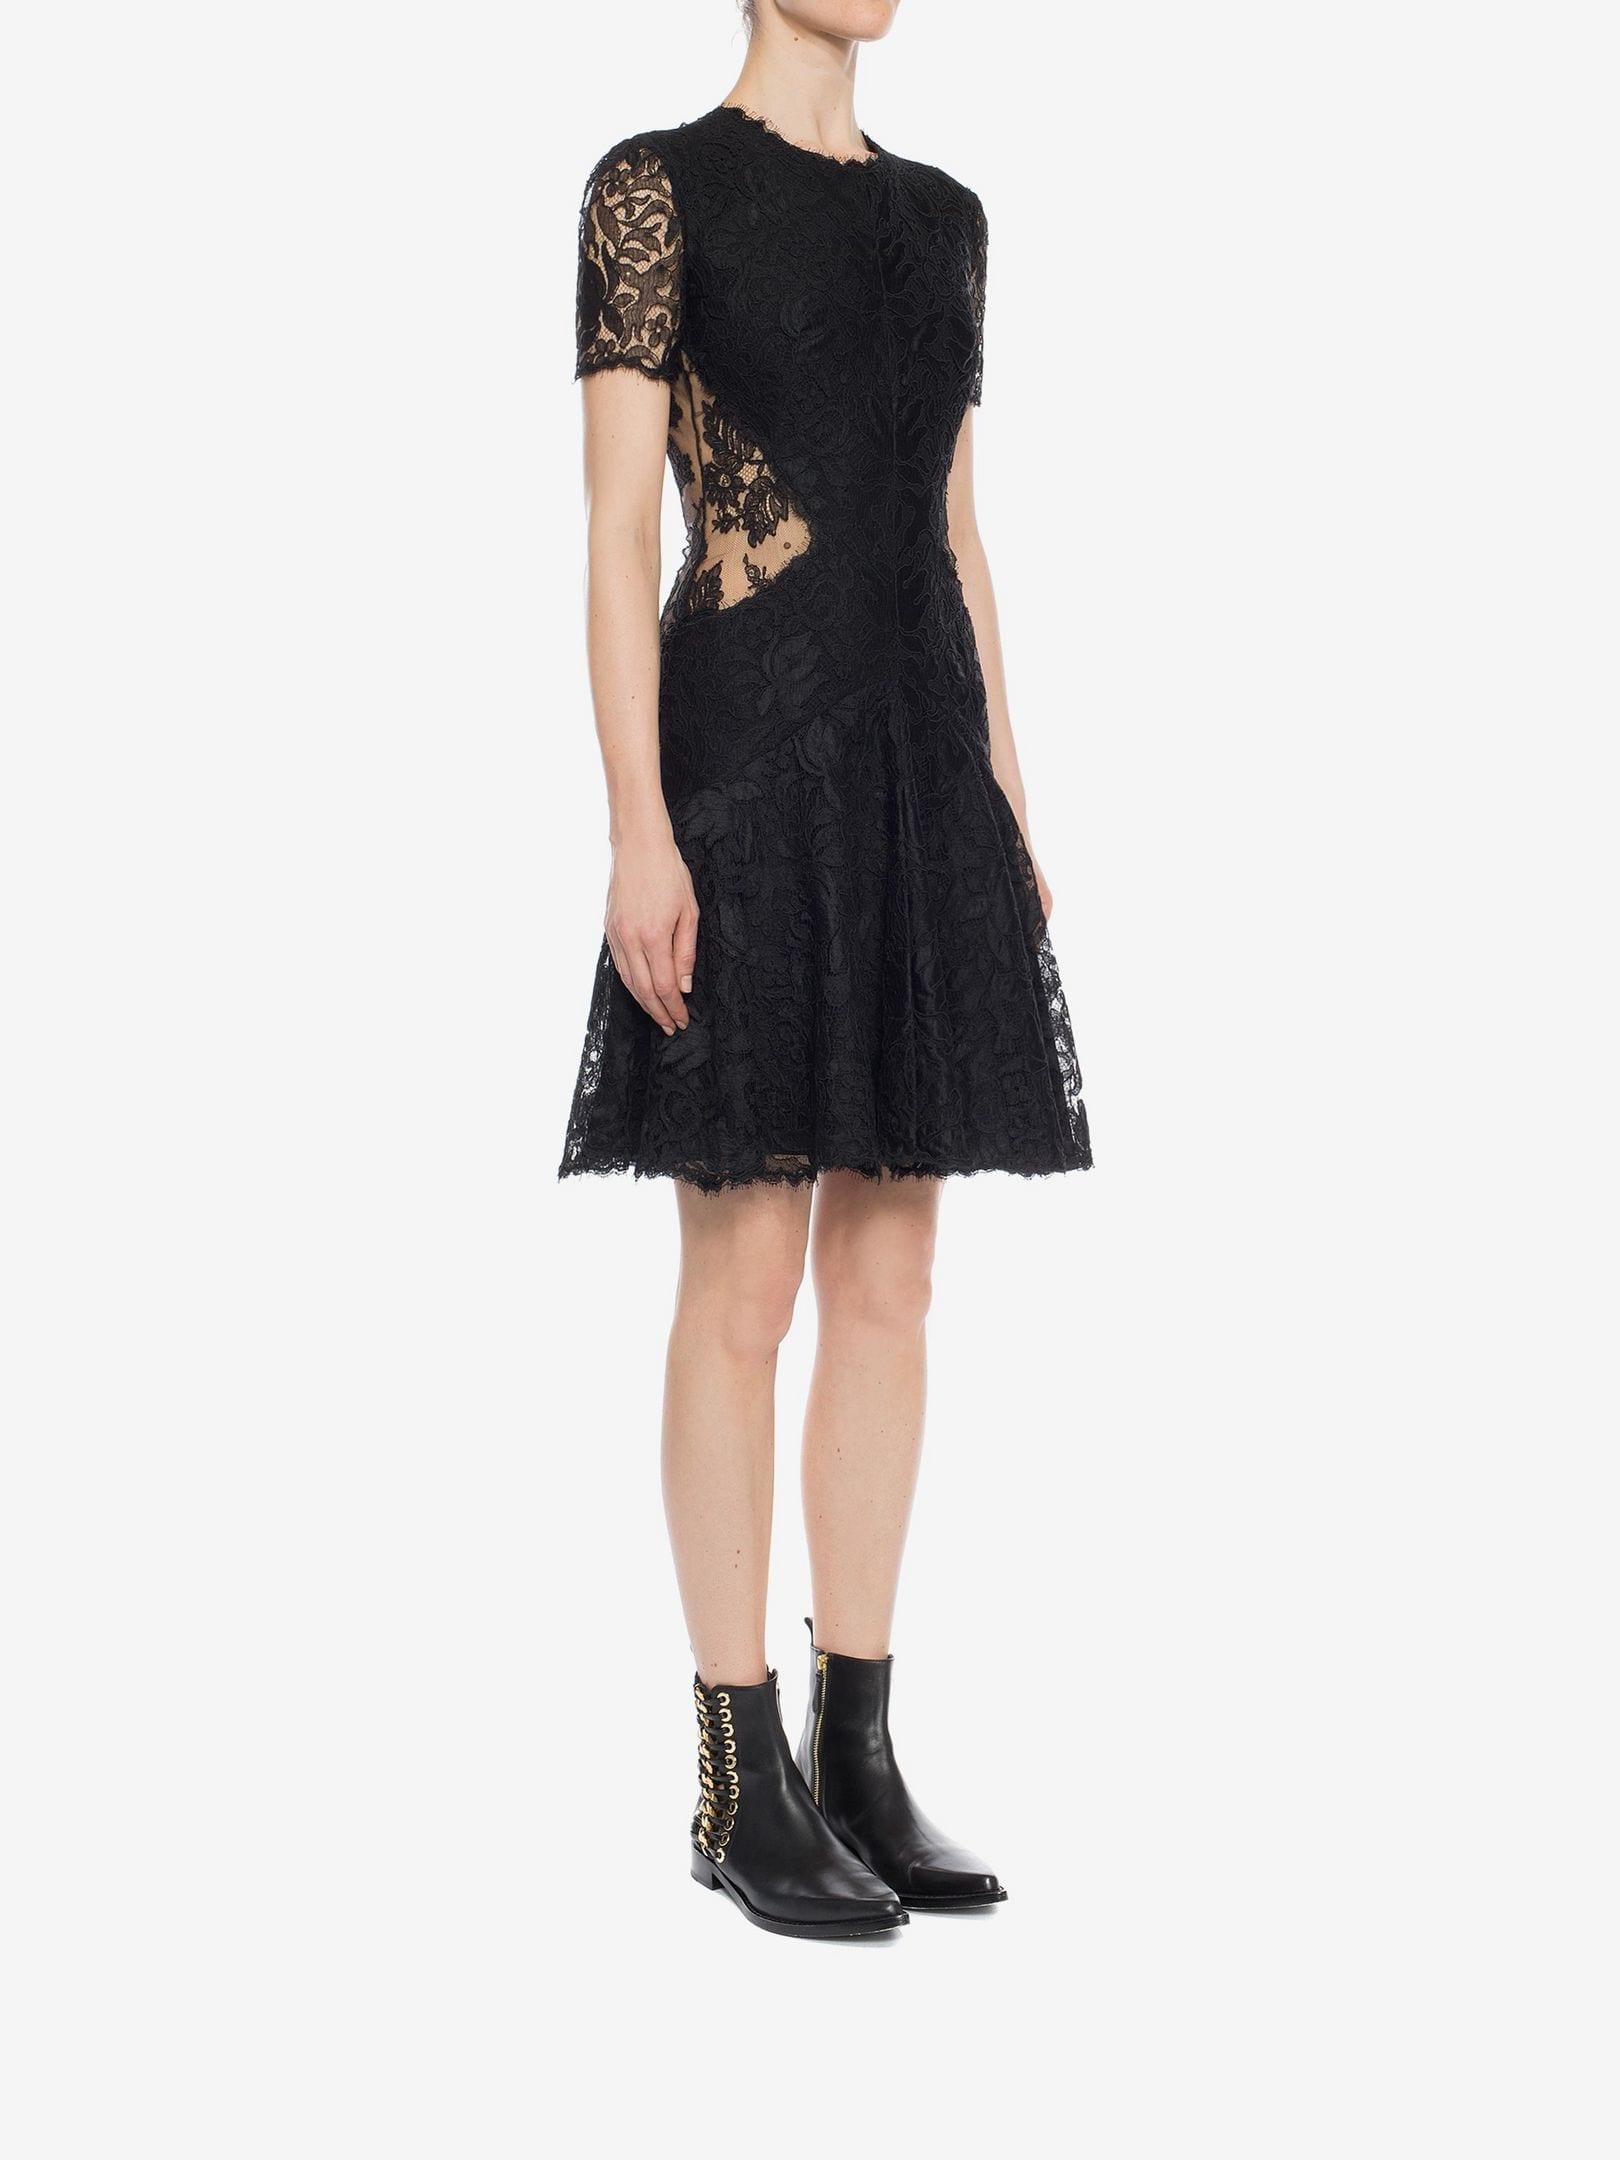 ALEXANDER MCQUEEN Lace Mini Black Dress - We Select Dresses